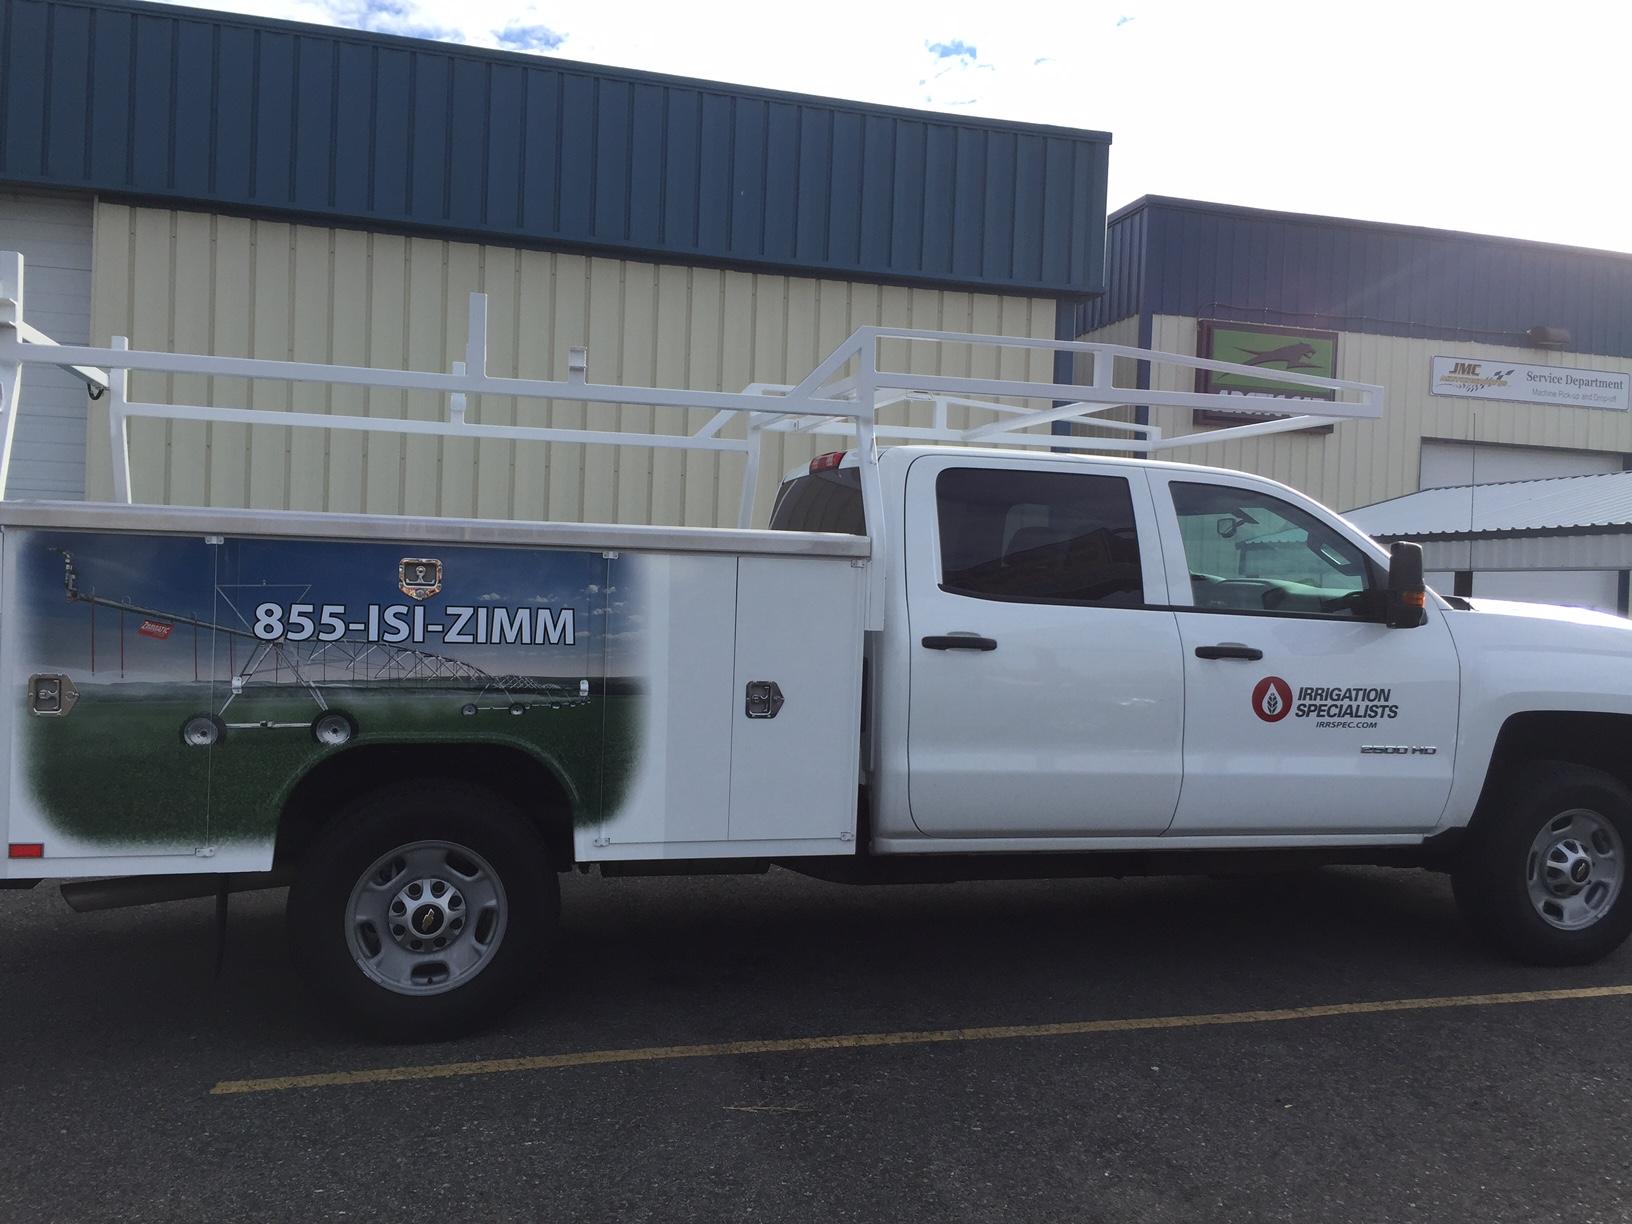 Irrigation Specialists Service Truck.JPG